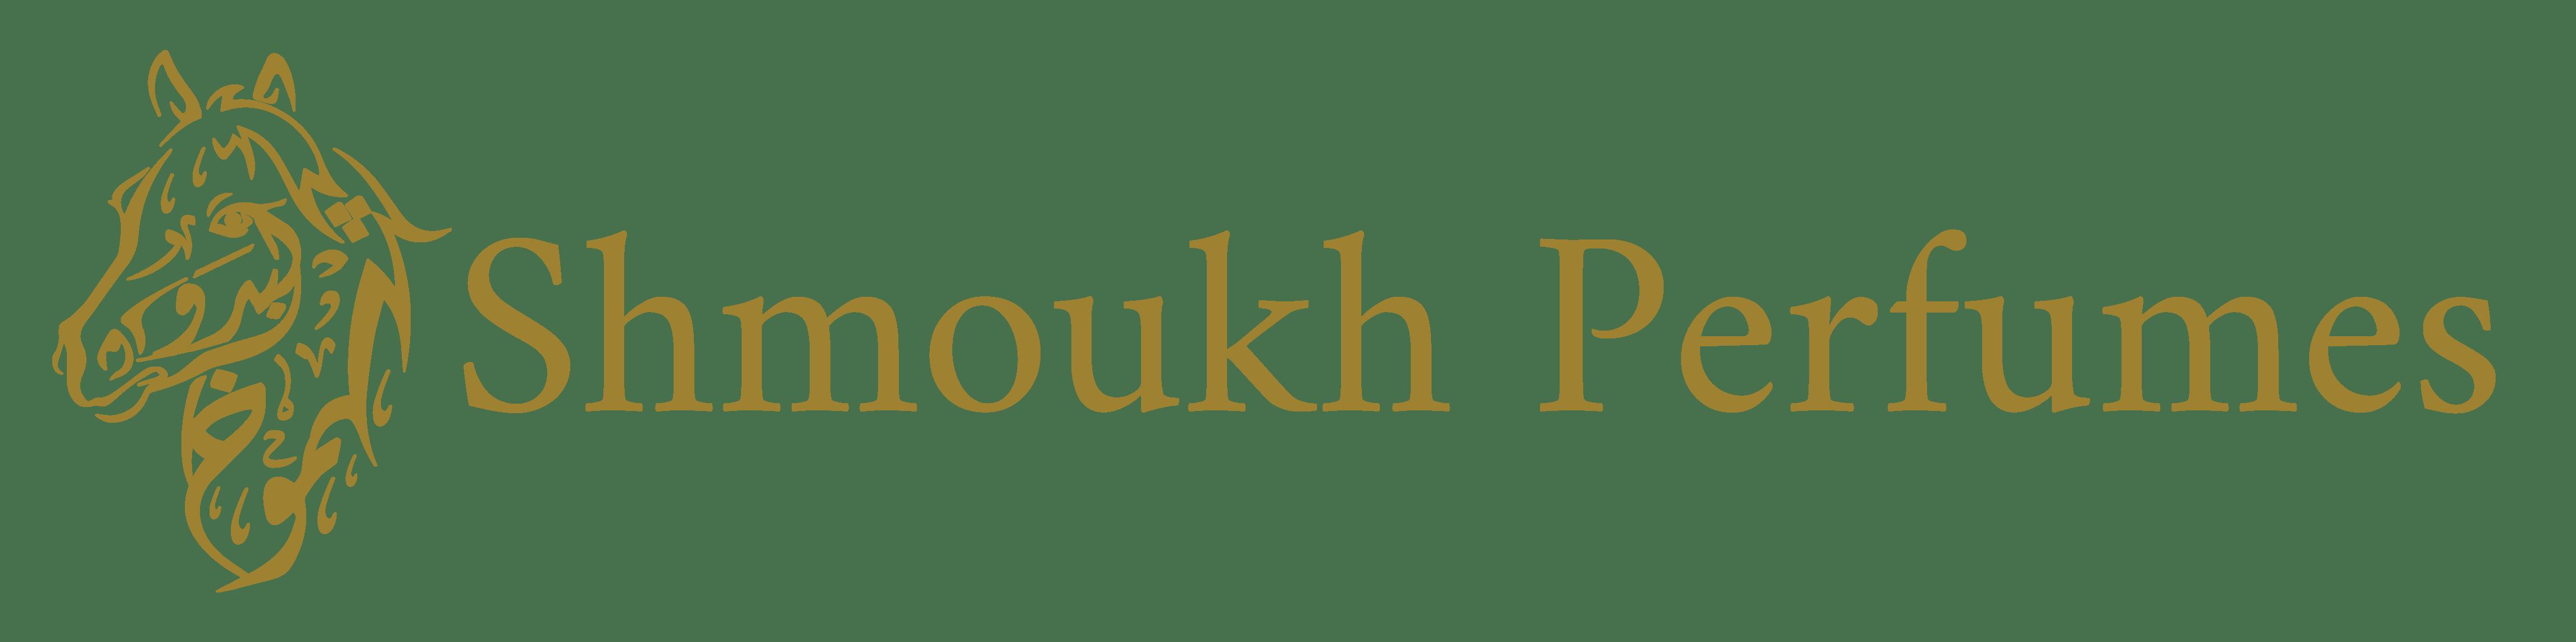 Shmoukh Logo Gold